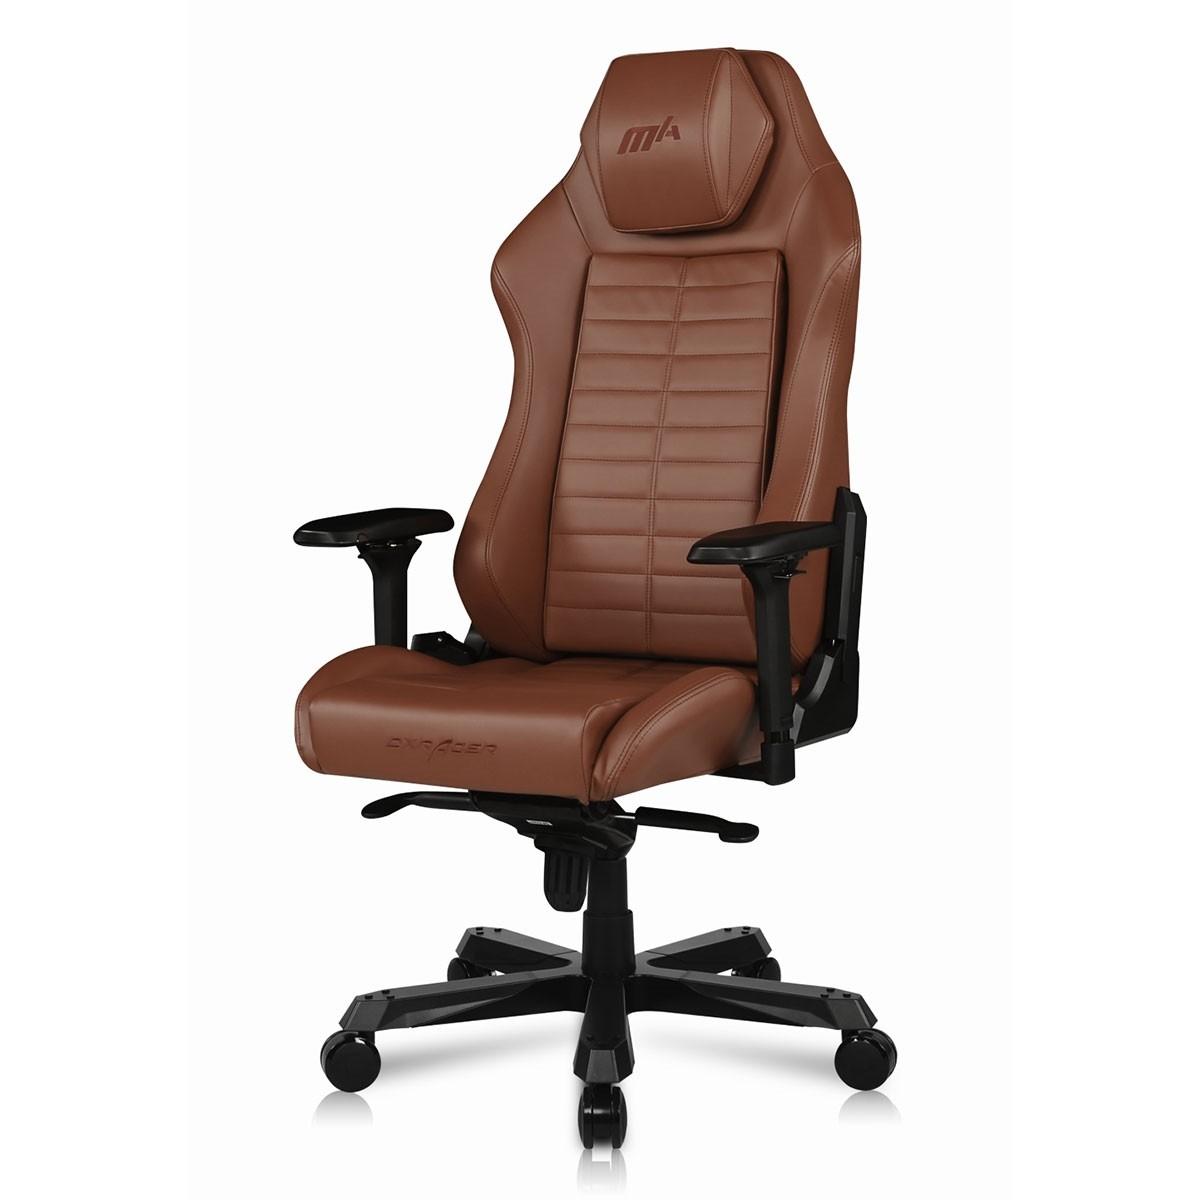 Cadeira Master DM1000 Max Brown I-Series - DXRACER